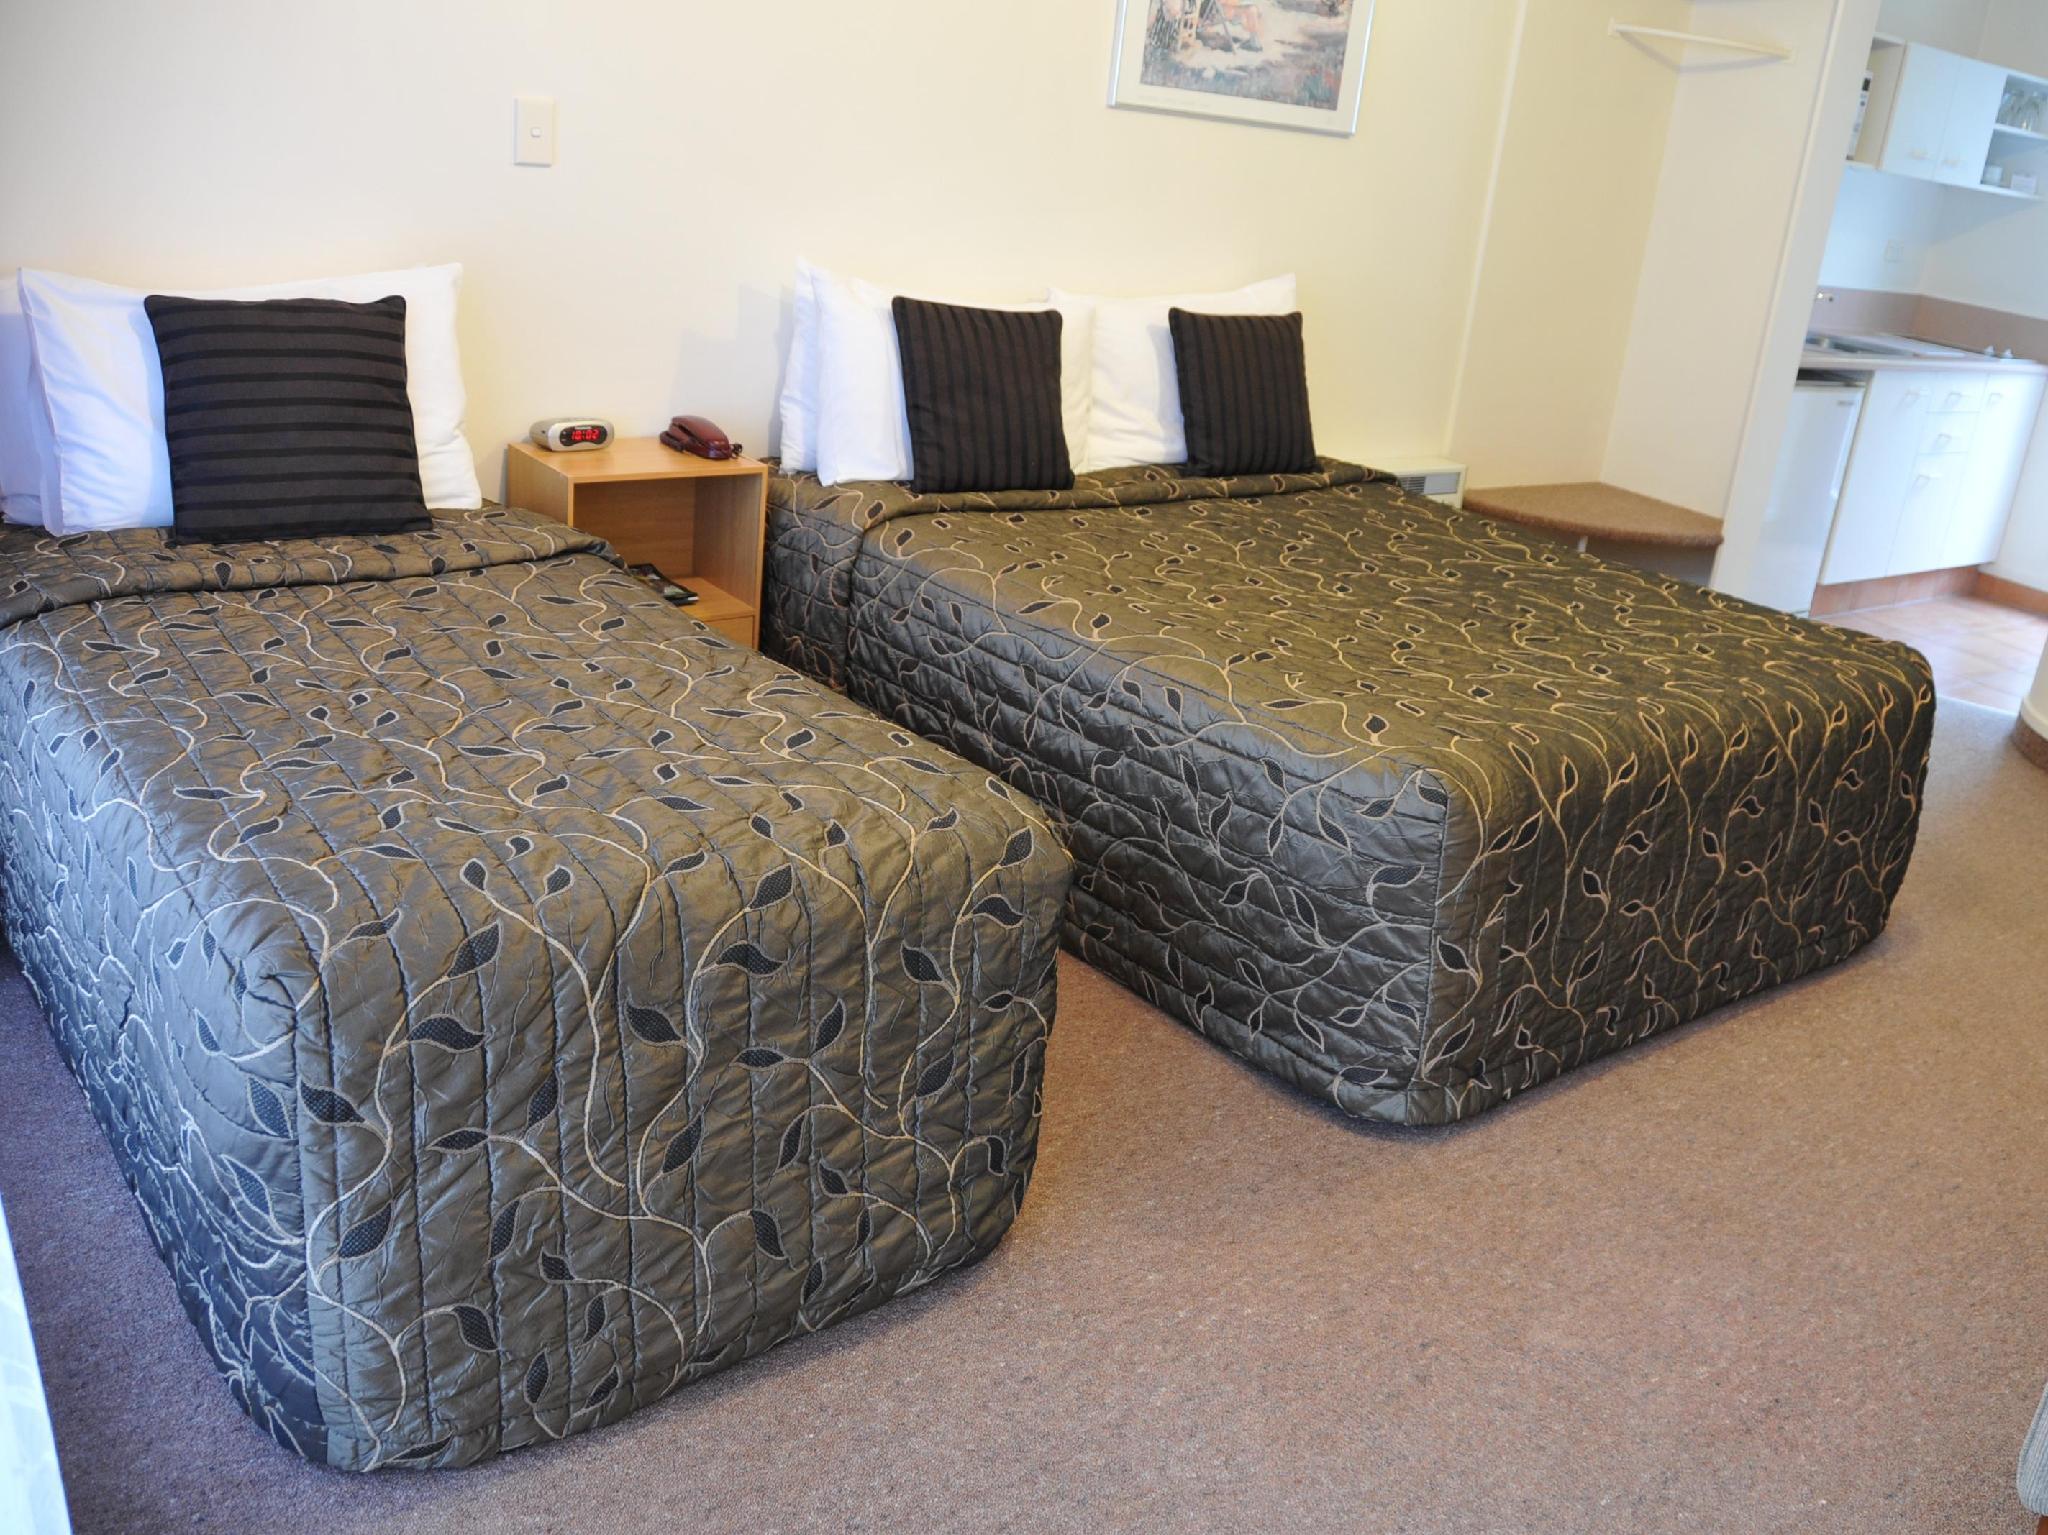 Executive Motel Taupo New Zealand